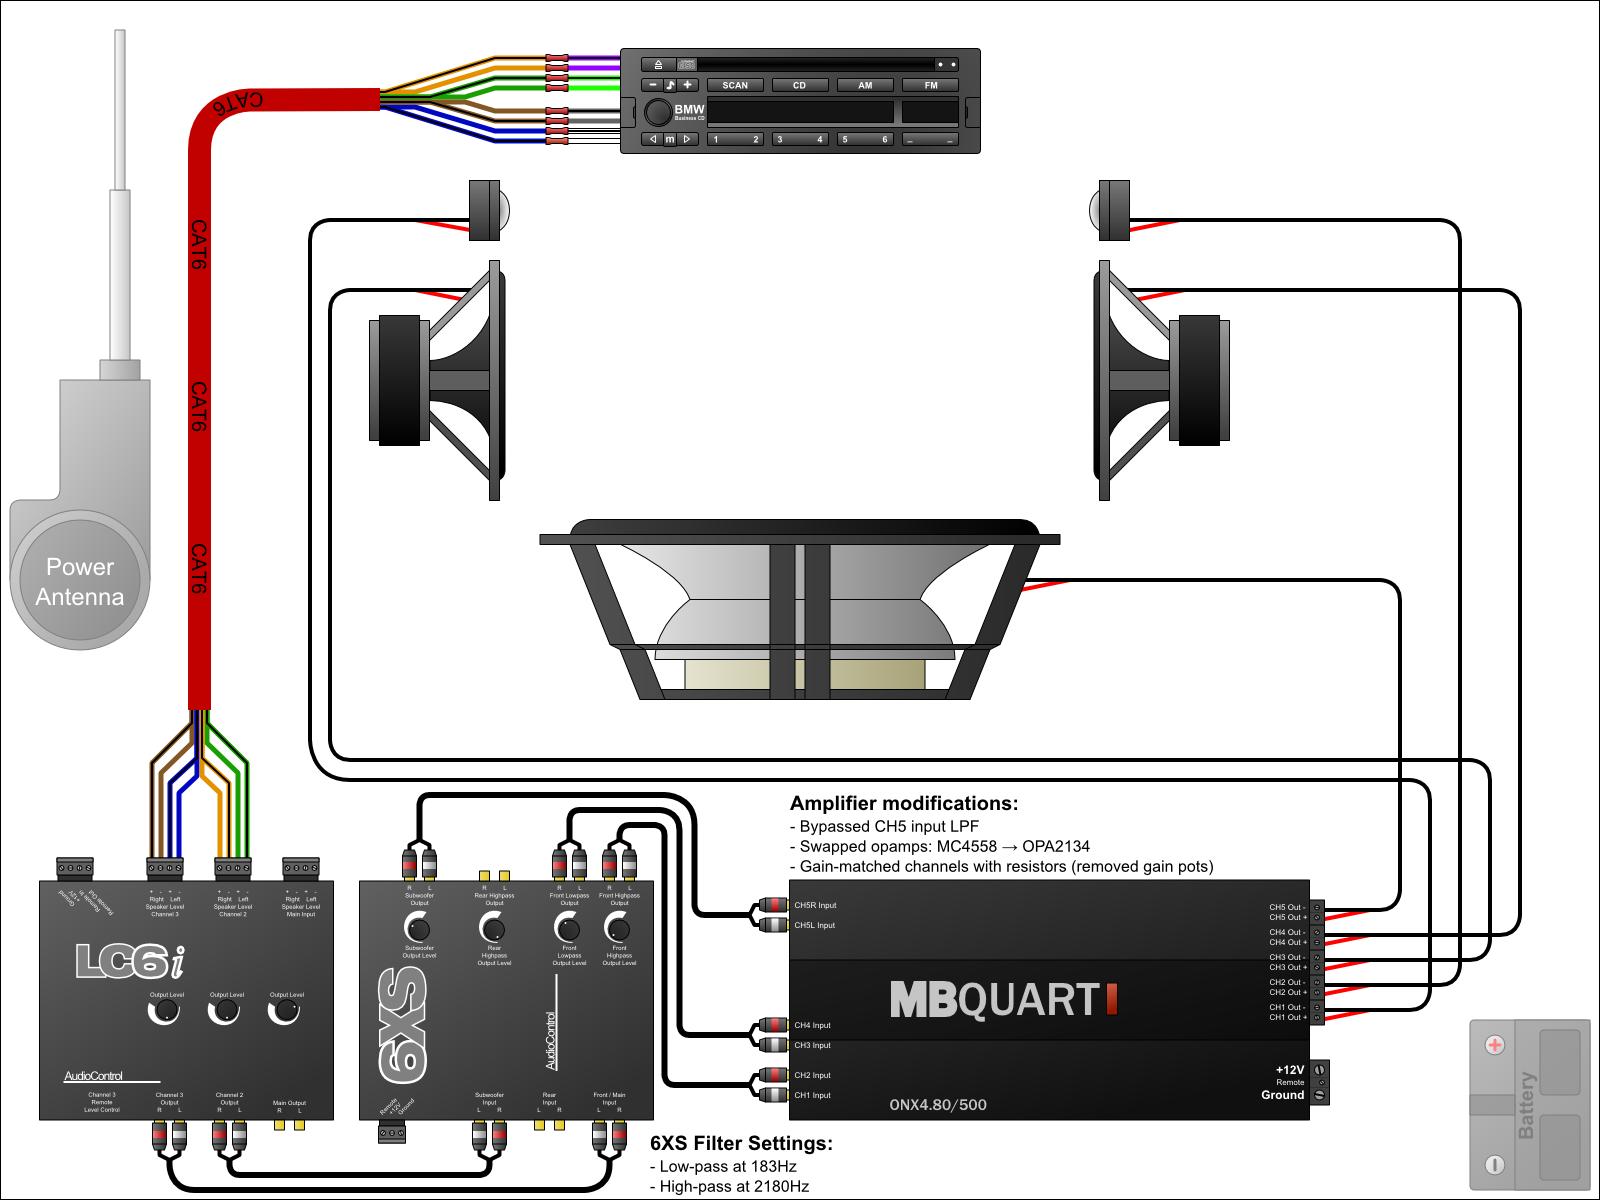 subwoofer amp wiring diagram om 0159  car stereo wiring diagram on wiring diagram for car  om 0159  car stereo wiring diagram on